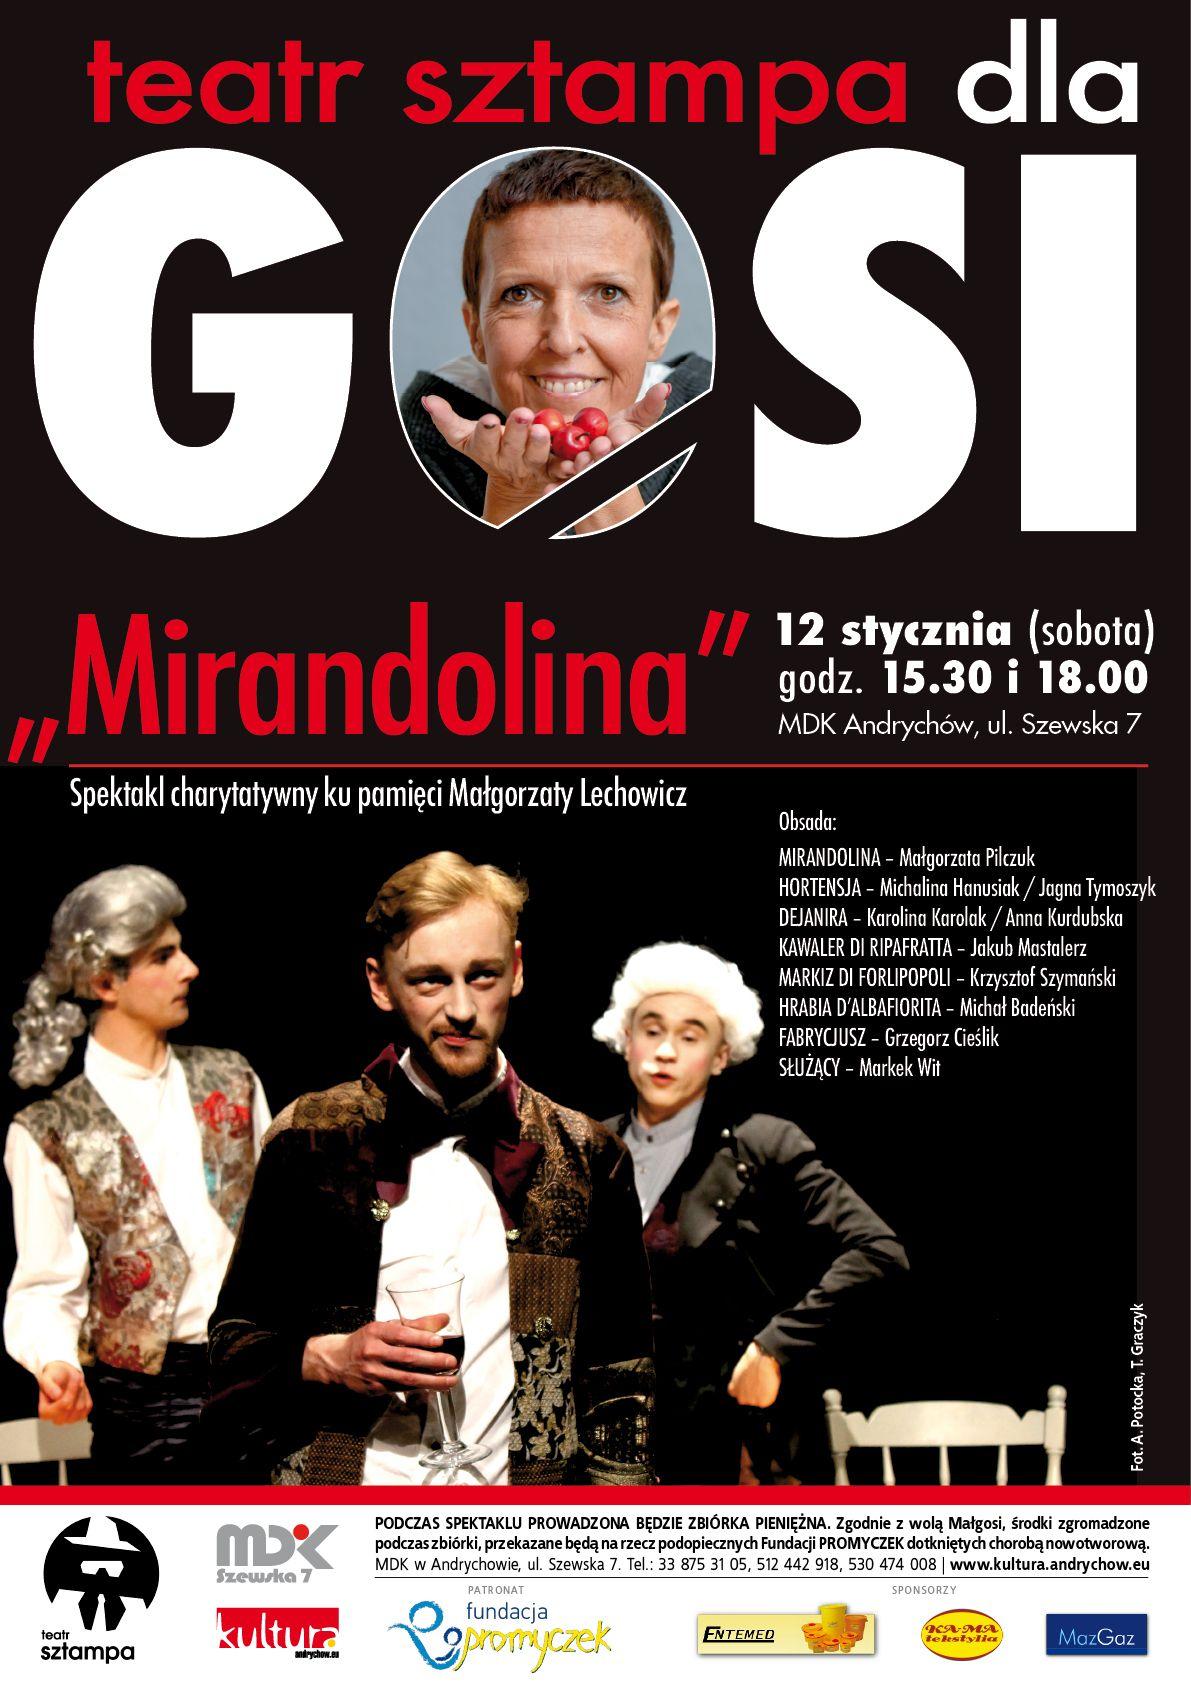 Teatr Sztampa ku pamięci Gosi Lechowicz